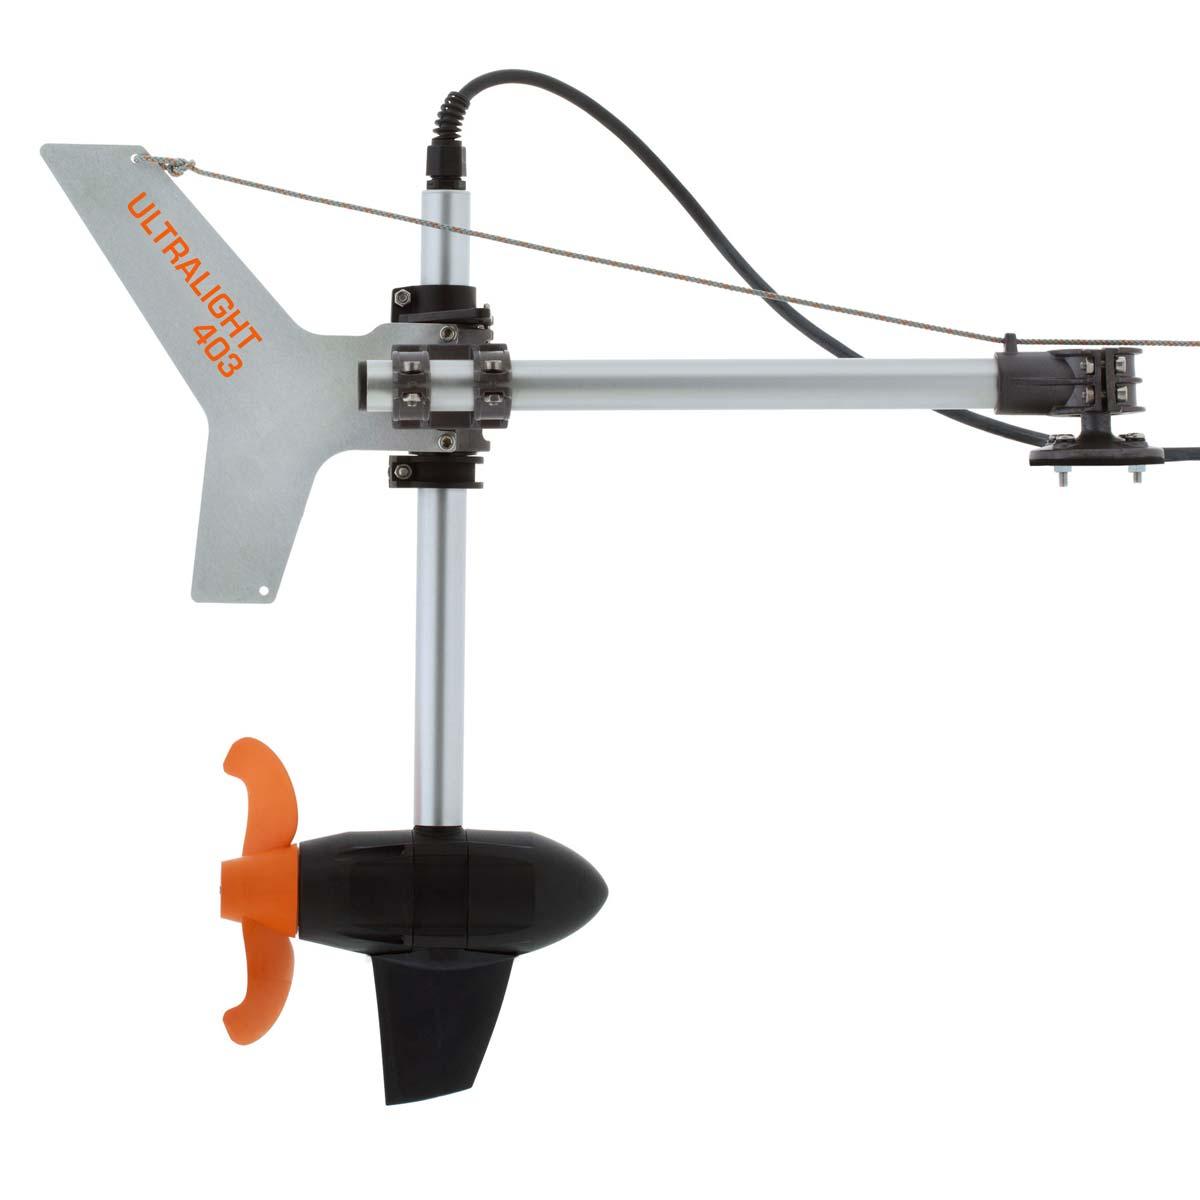 torqeedo-ultralight-403-1200×1200-2